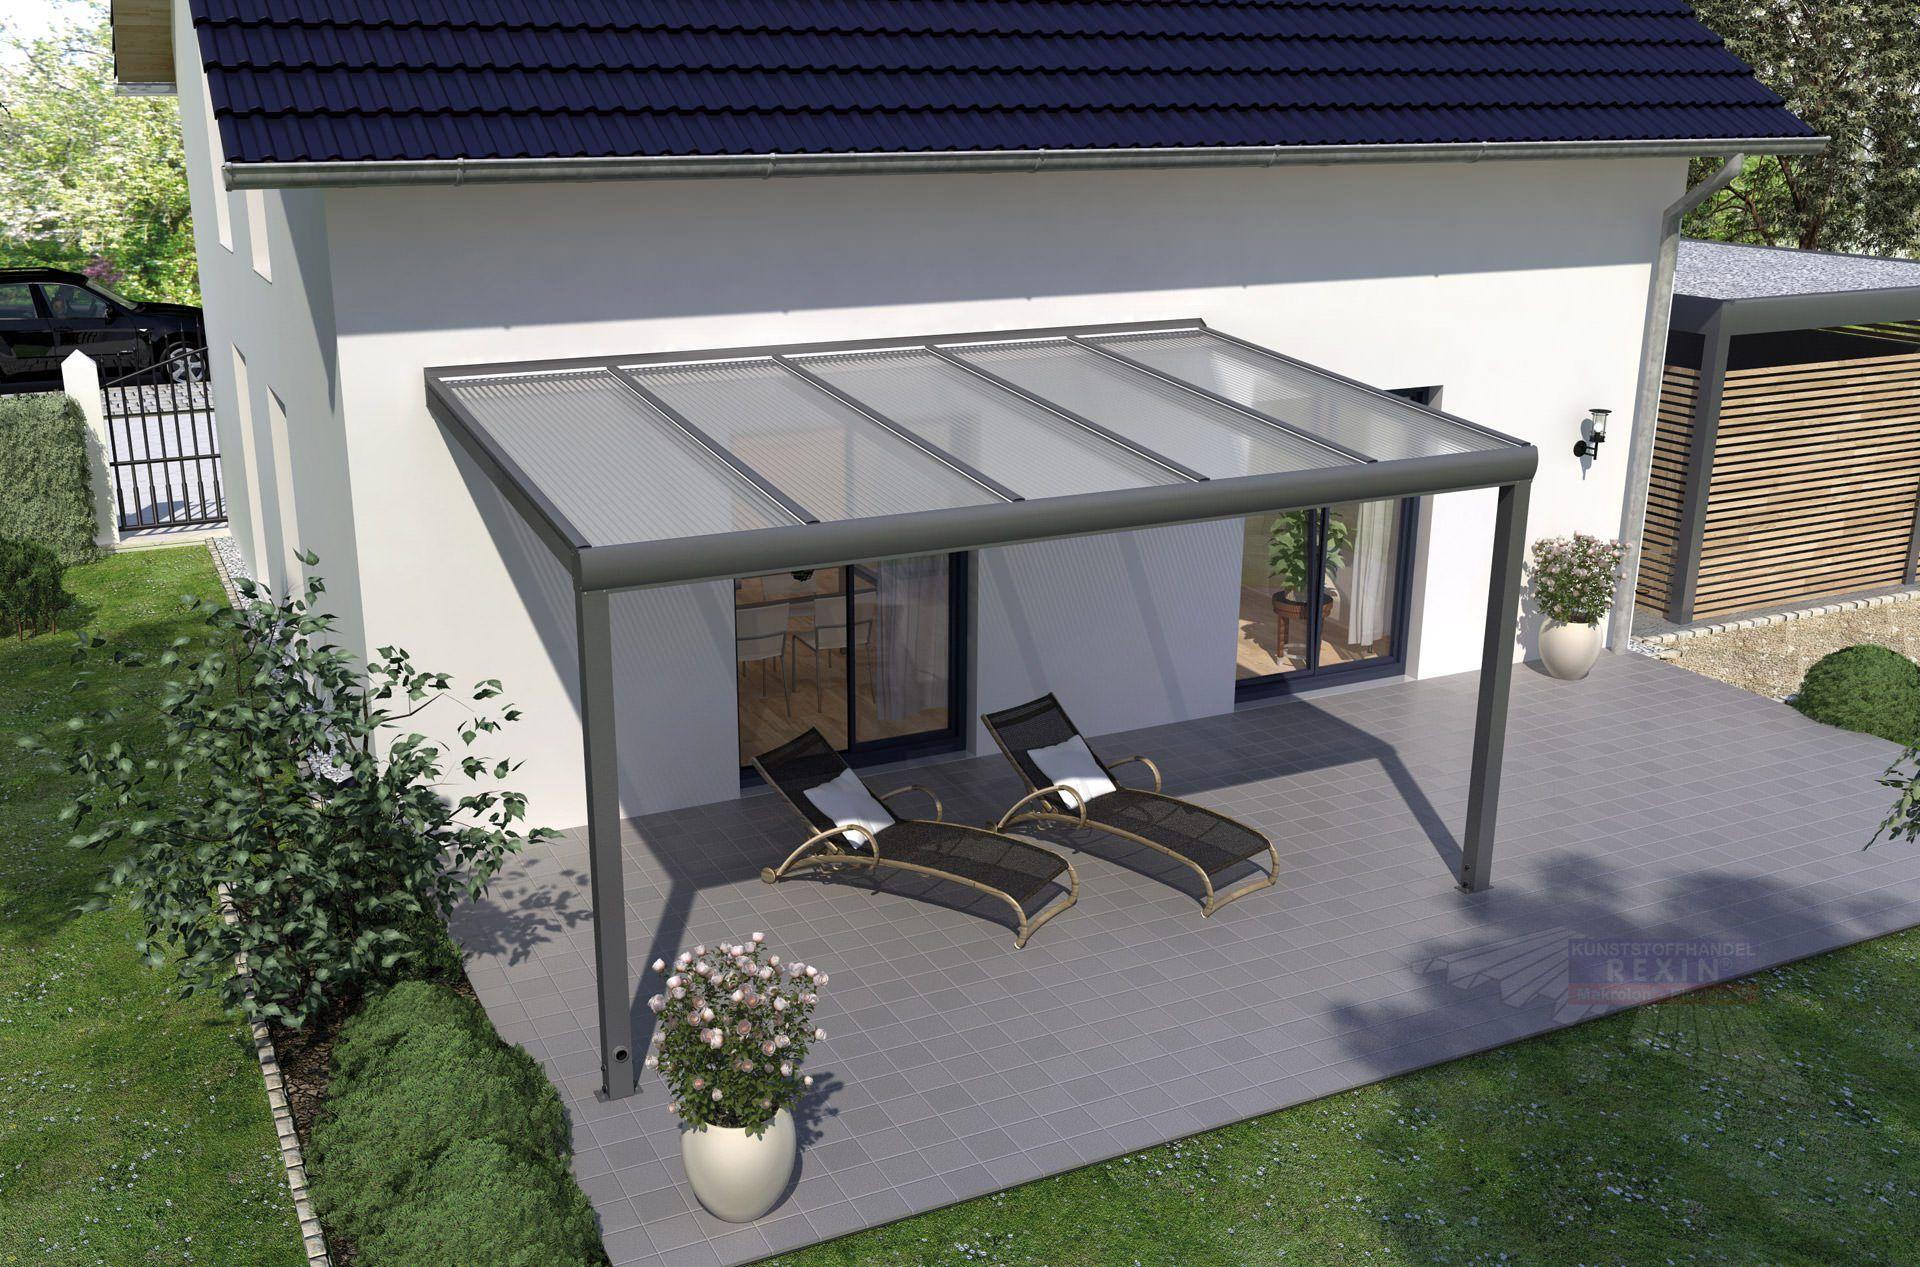 rexopremium alu terrassen berdachung 4m x 3 5m pergola pinterest terrassen berdachung. Black Bedroom Furniture Sets. Home Design Ideas